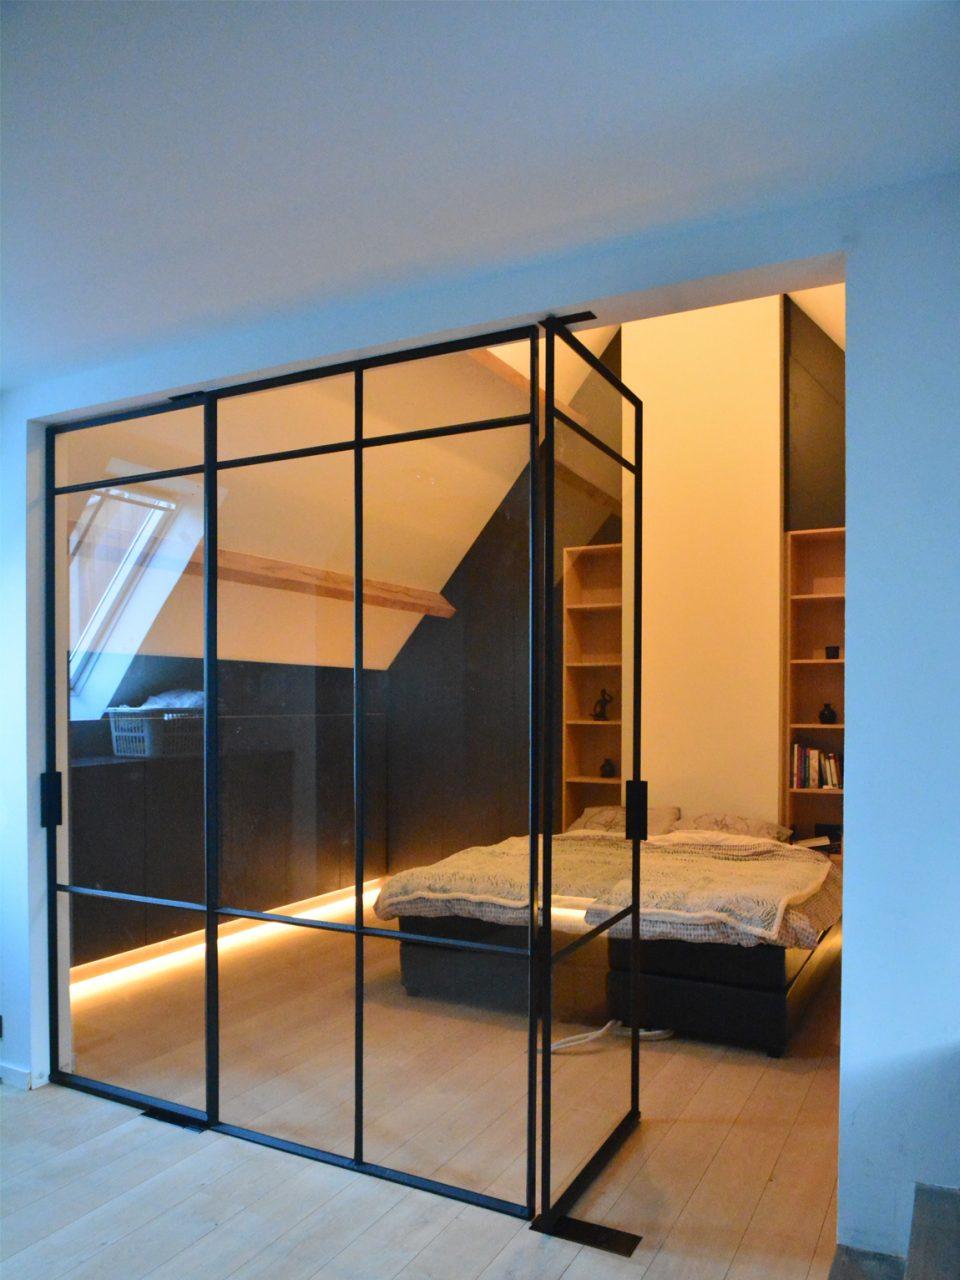 Scheidingswand, Taatsdeur, Stalen deuren, Stalen taatsdeur, Binnendeur, roomdivider